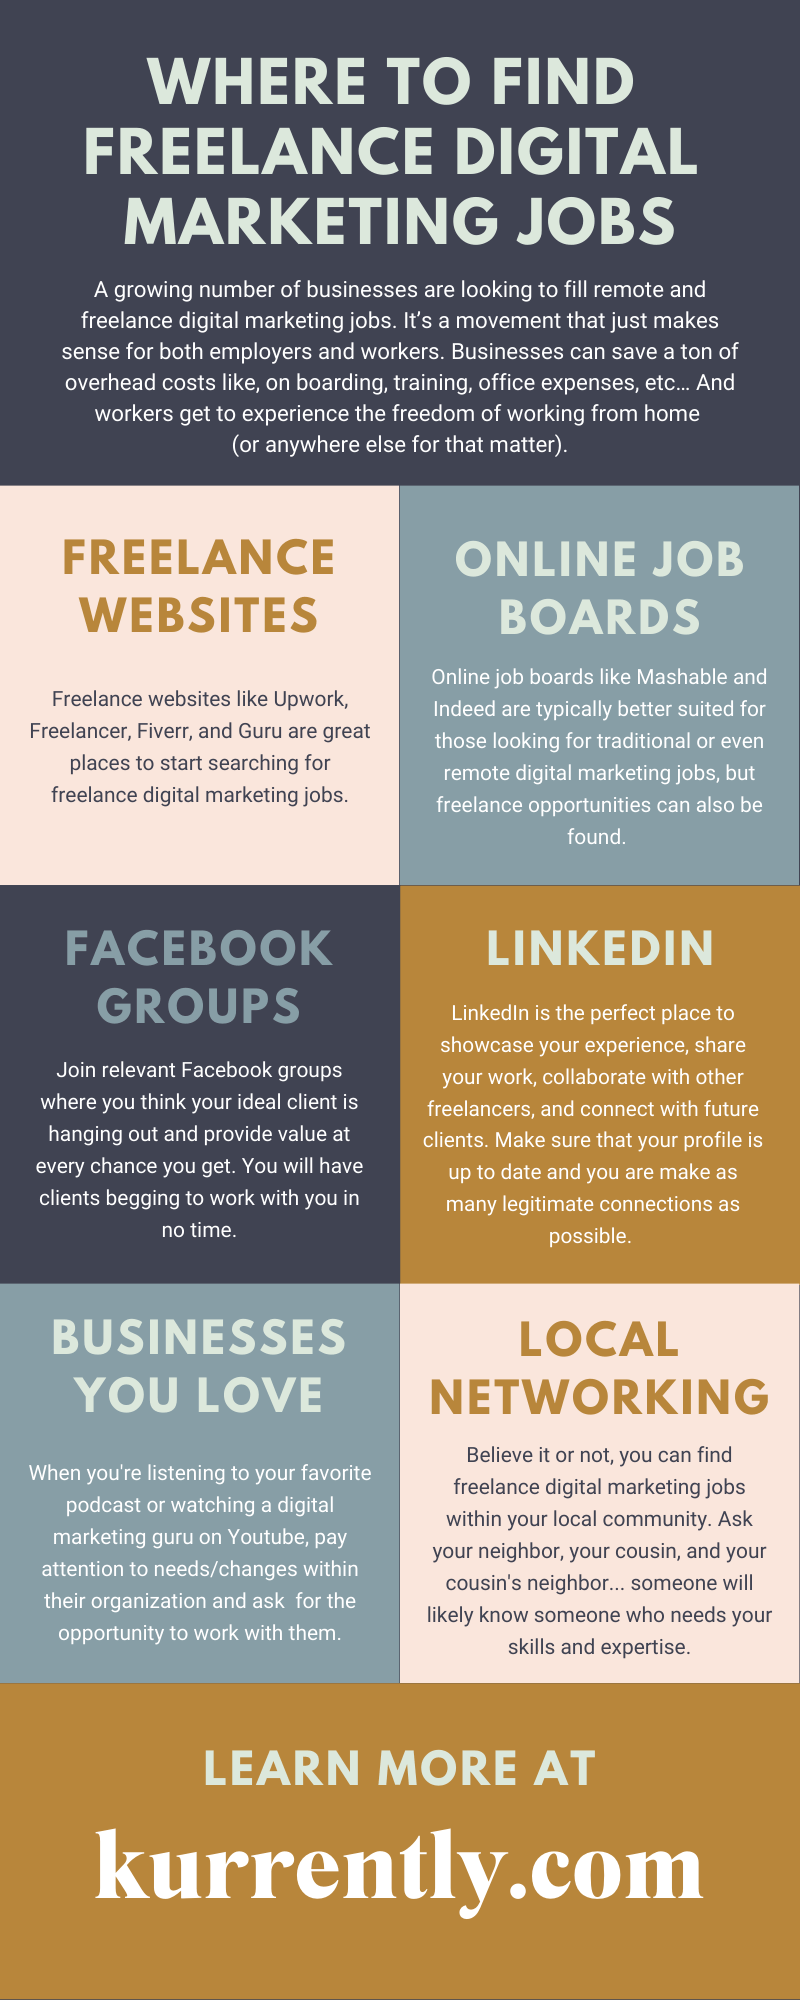 Freelance Digital Marketing Jobs Infographic Marketing Jobs Digital Marketing Digital Marketing Tools